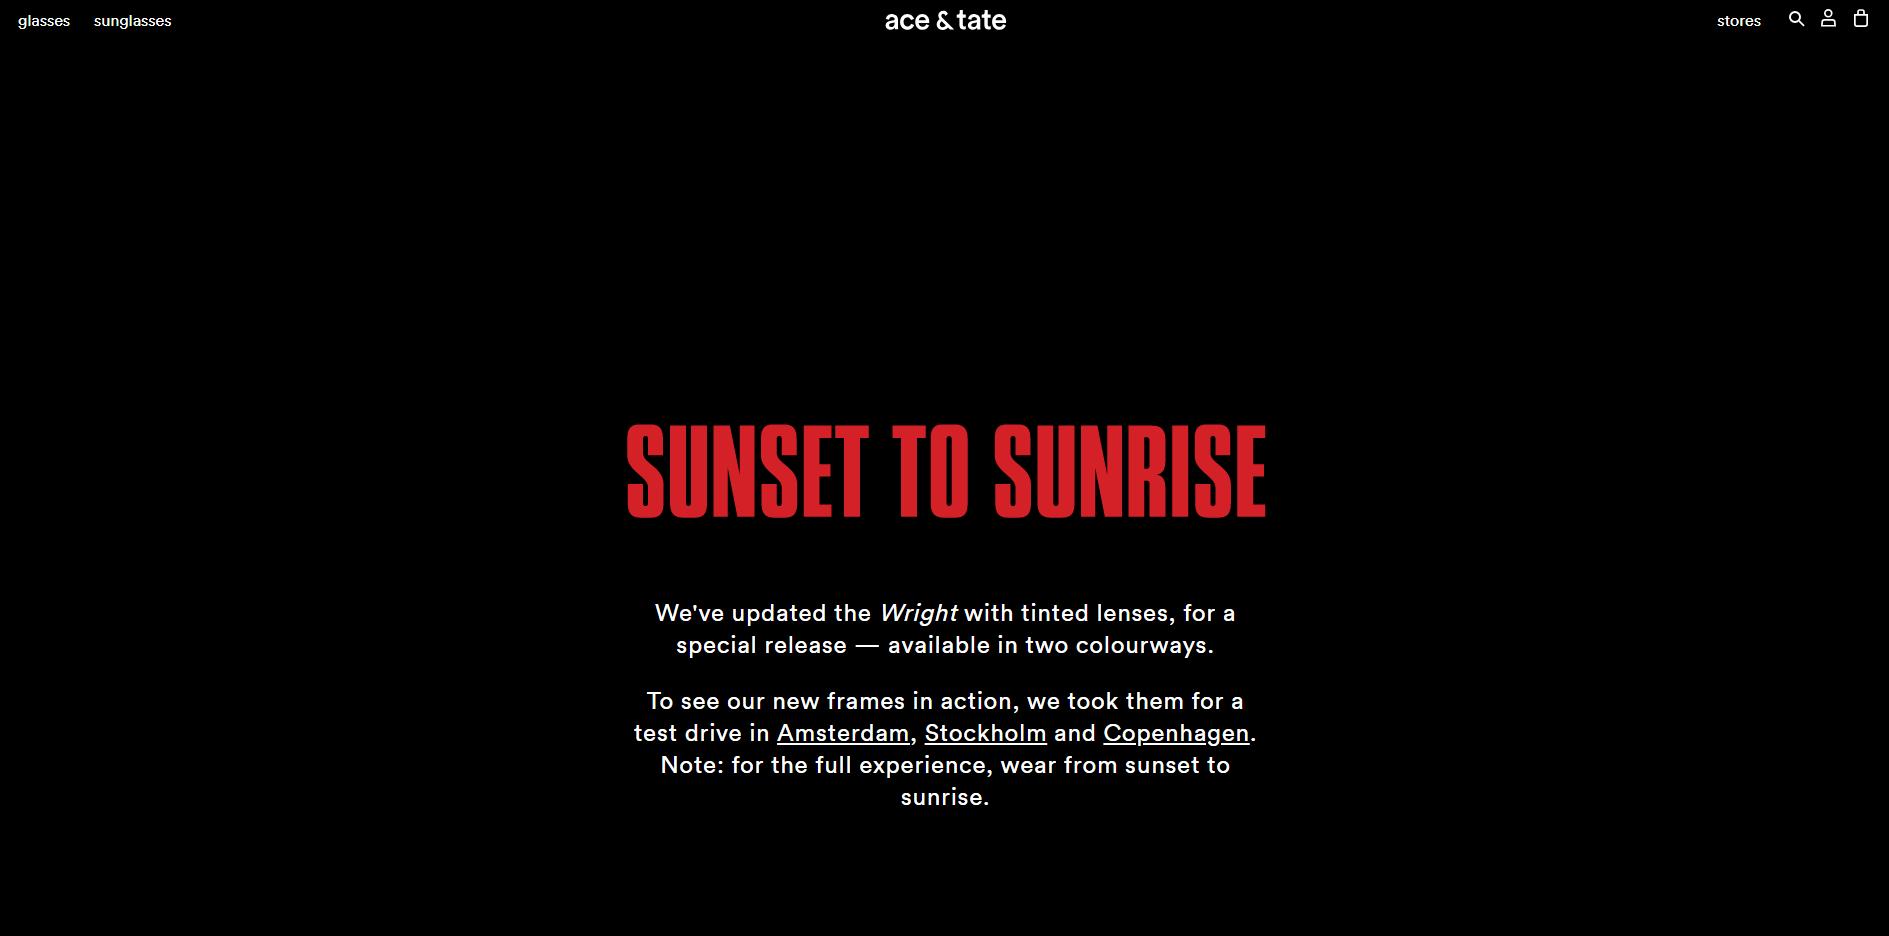 sunrise to sunset ace & tate